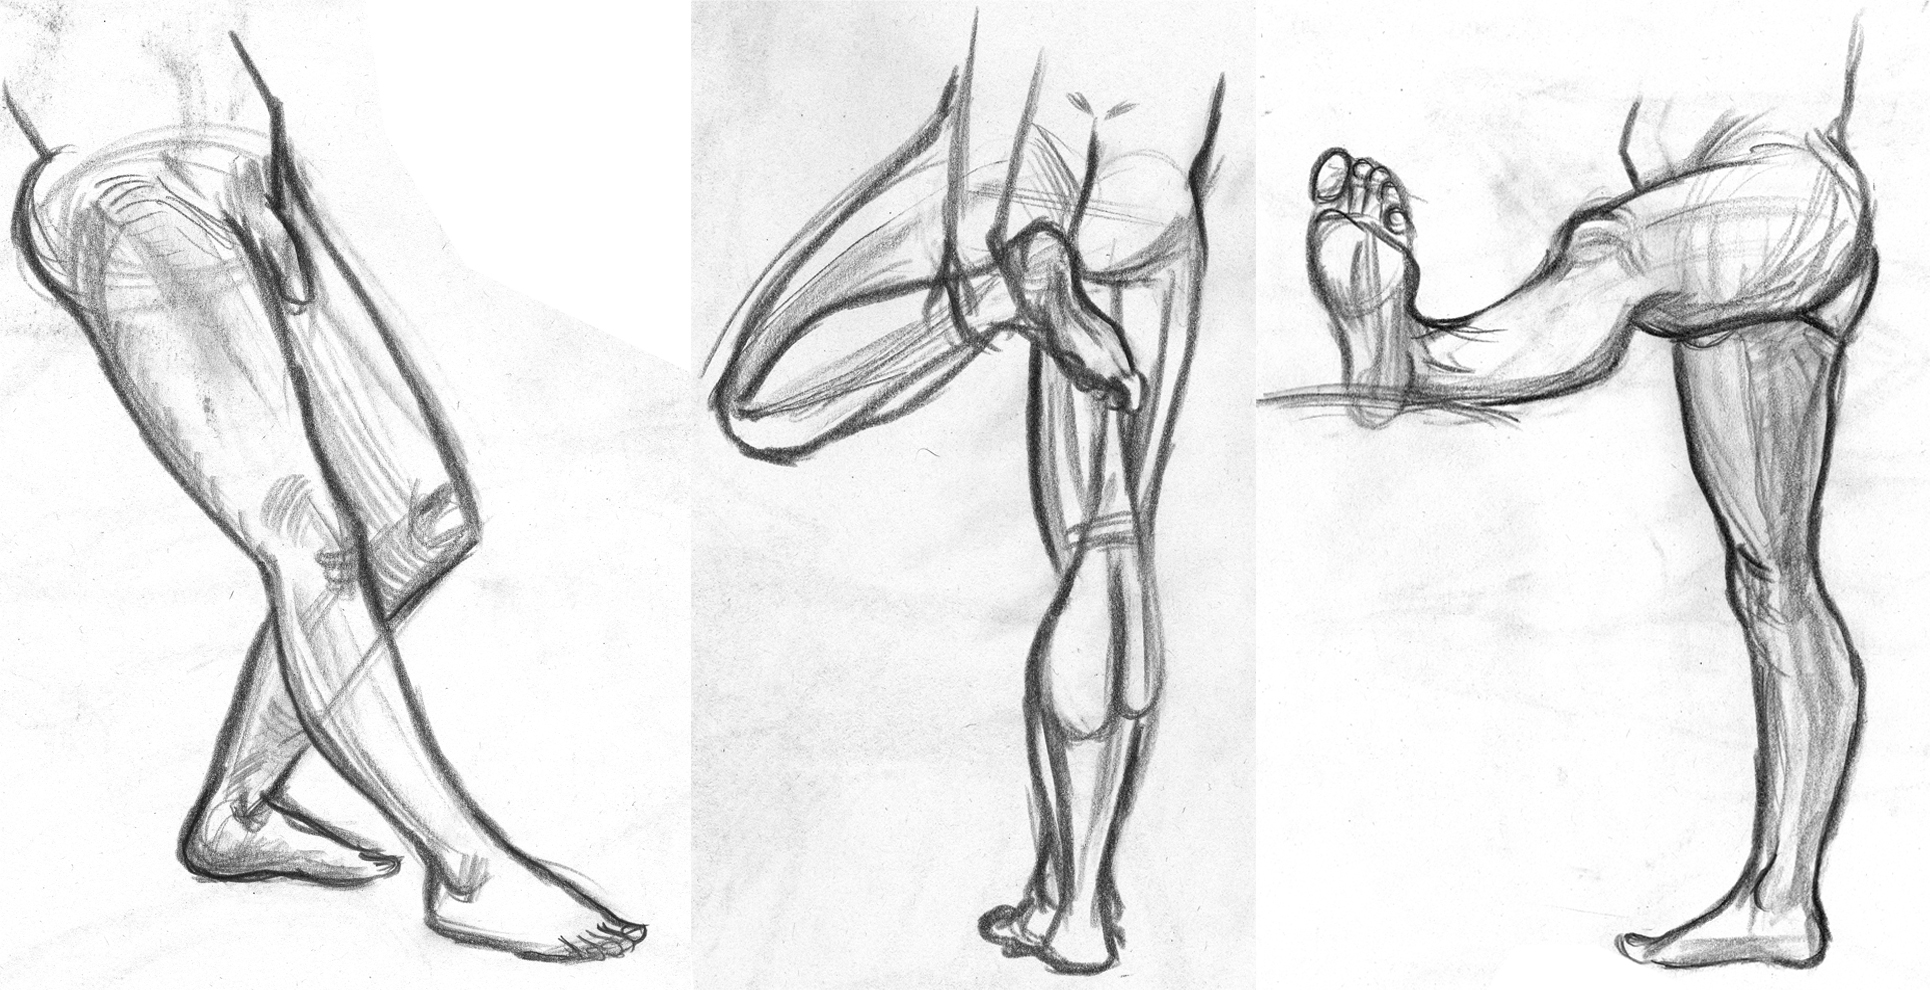 LD__Leg_Anatomy_by_pyuan.jpg